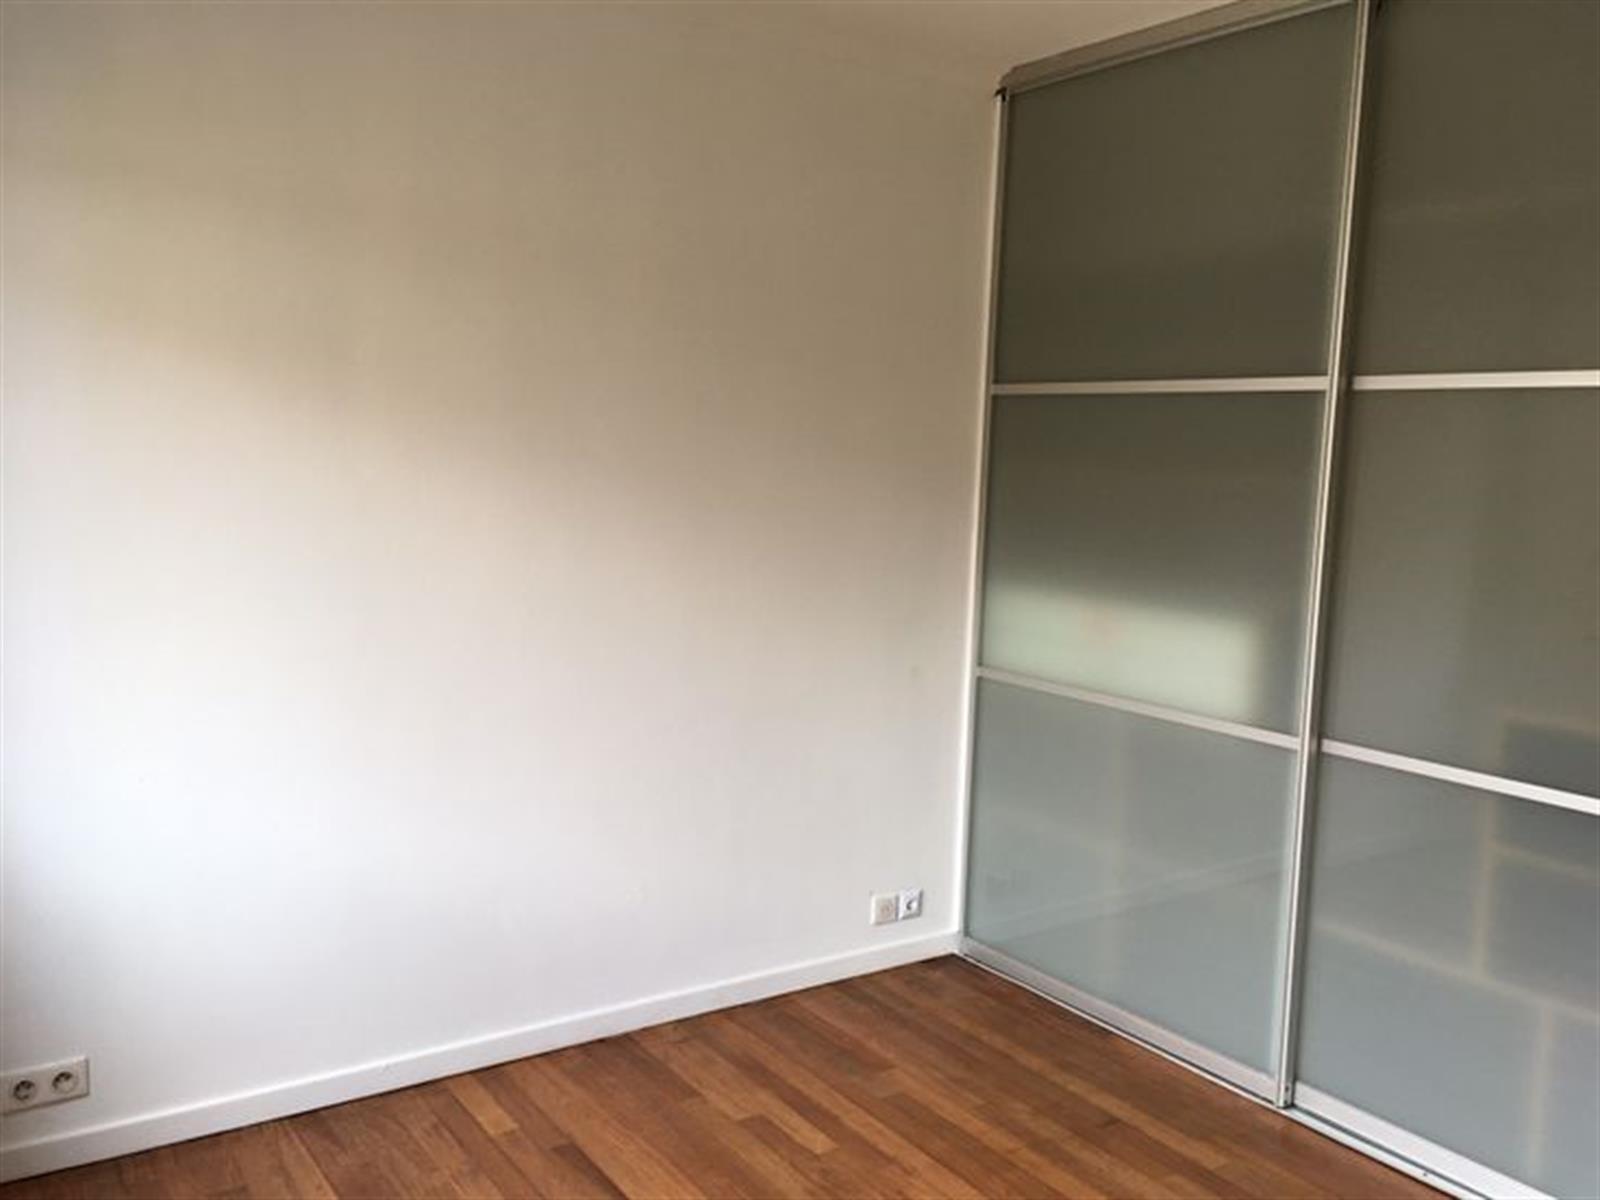 Appartement - Woluwe-Saint-Lambert - #4403252-16